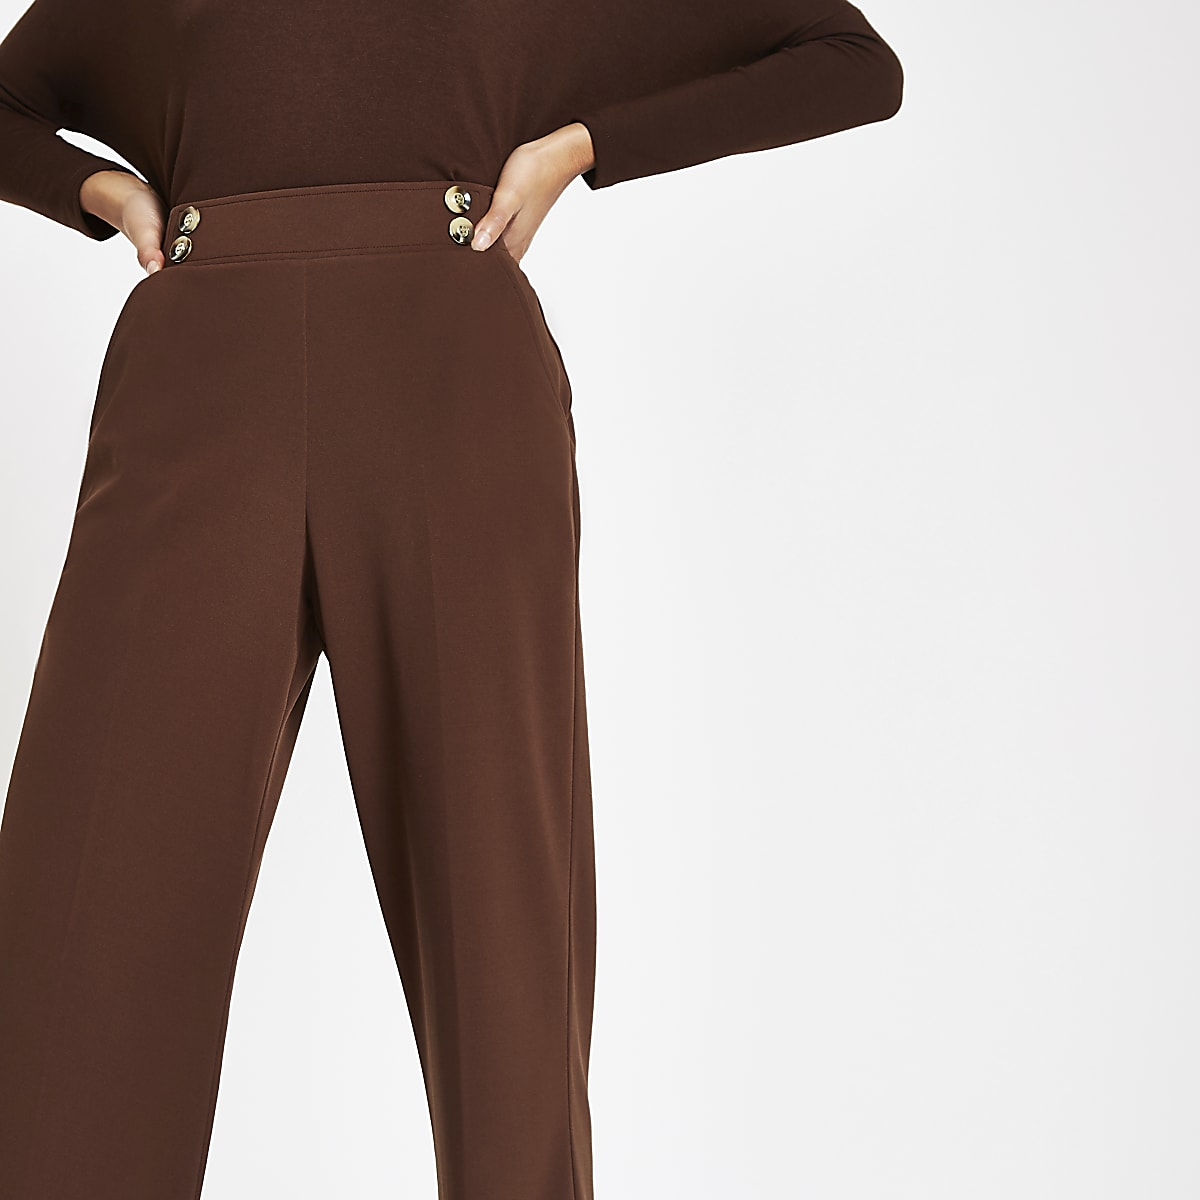 Pantalon large marron à boutons